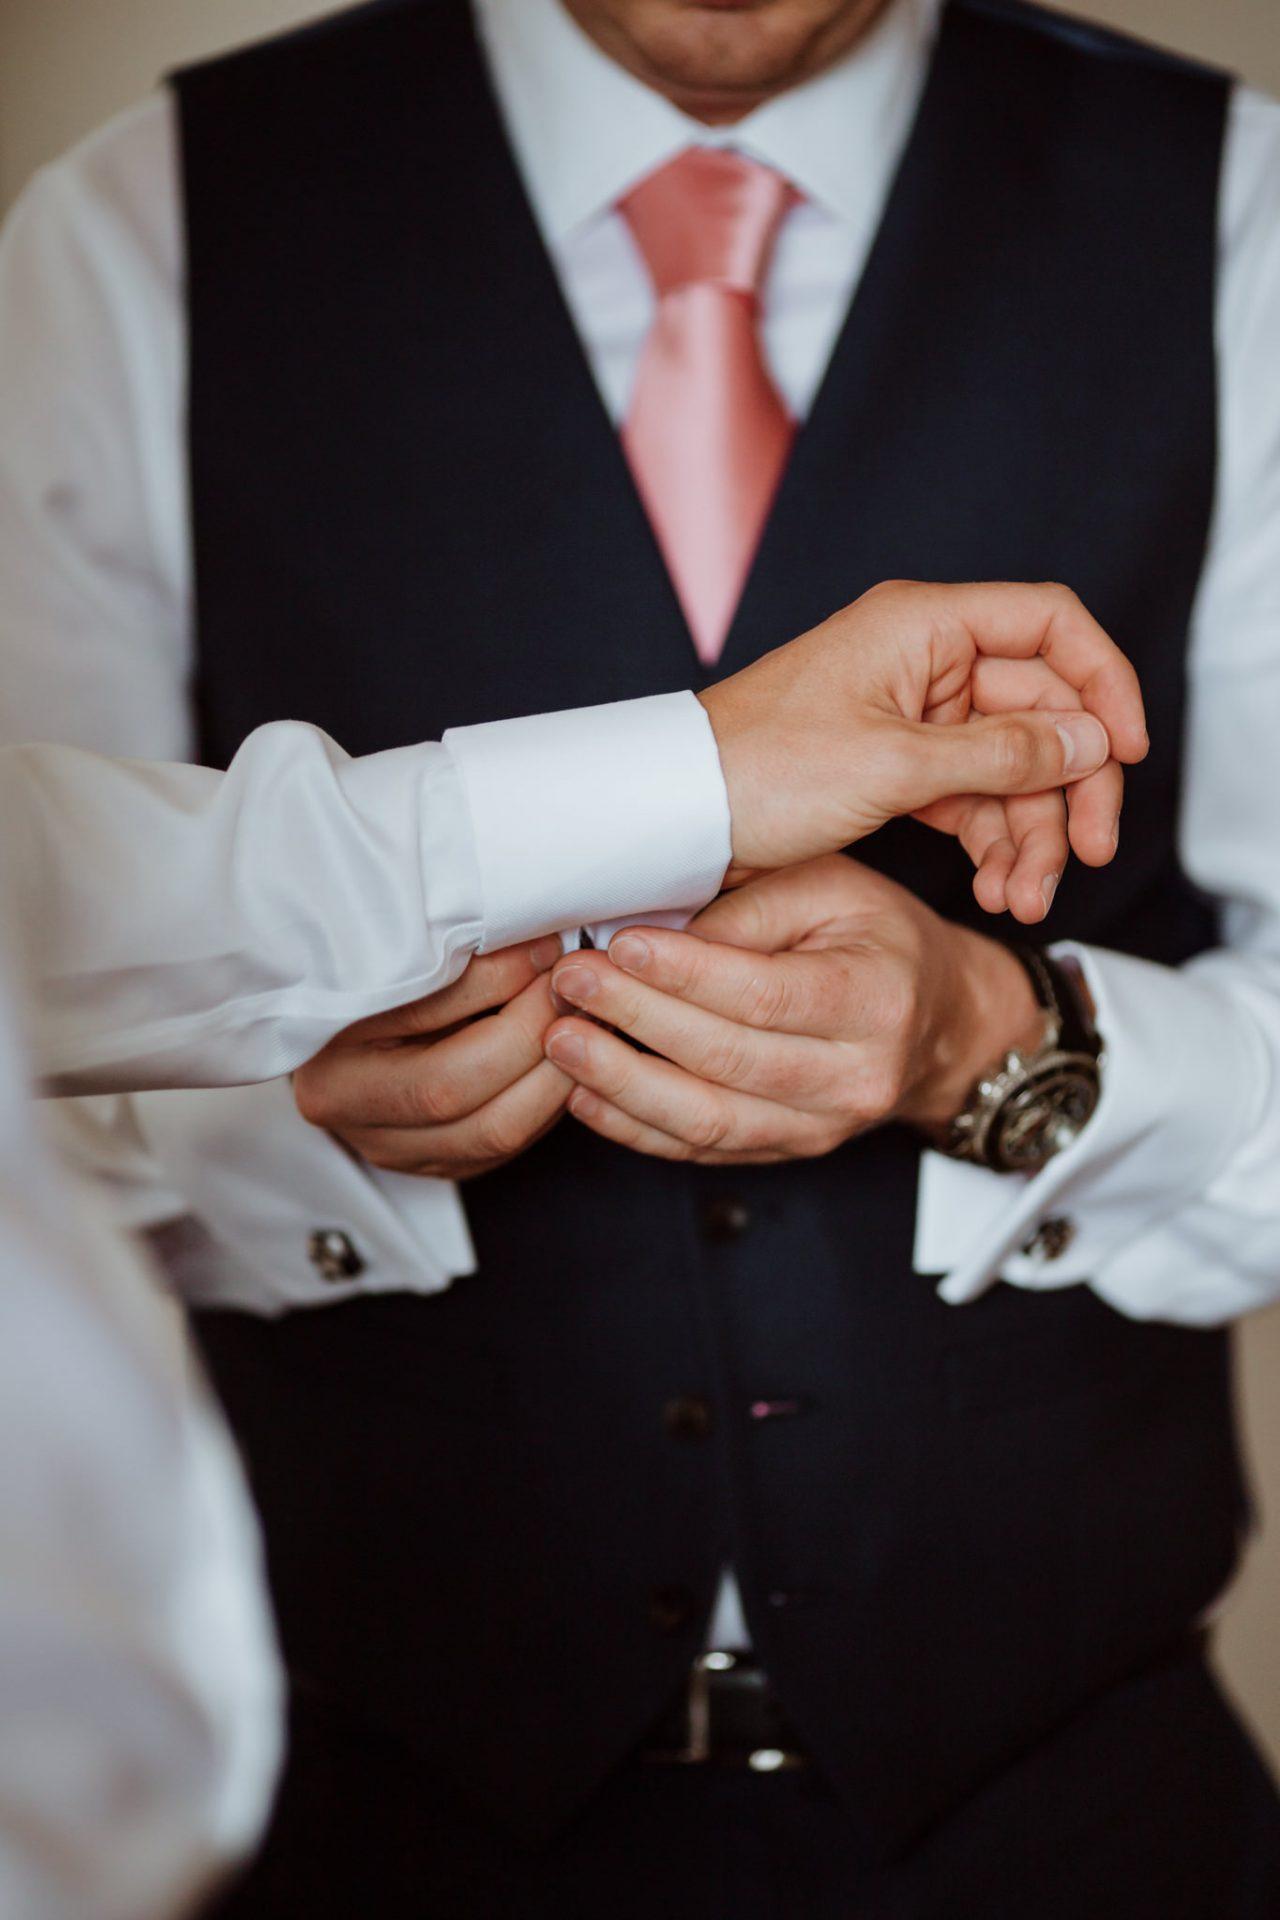 groomsman putting on the grooms cufflinks